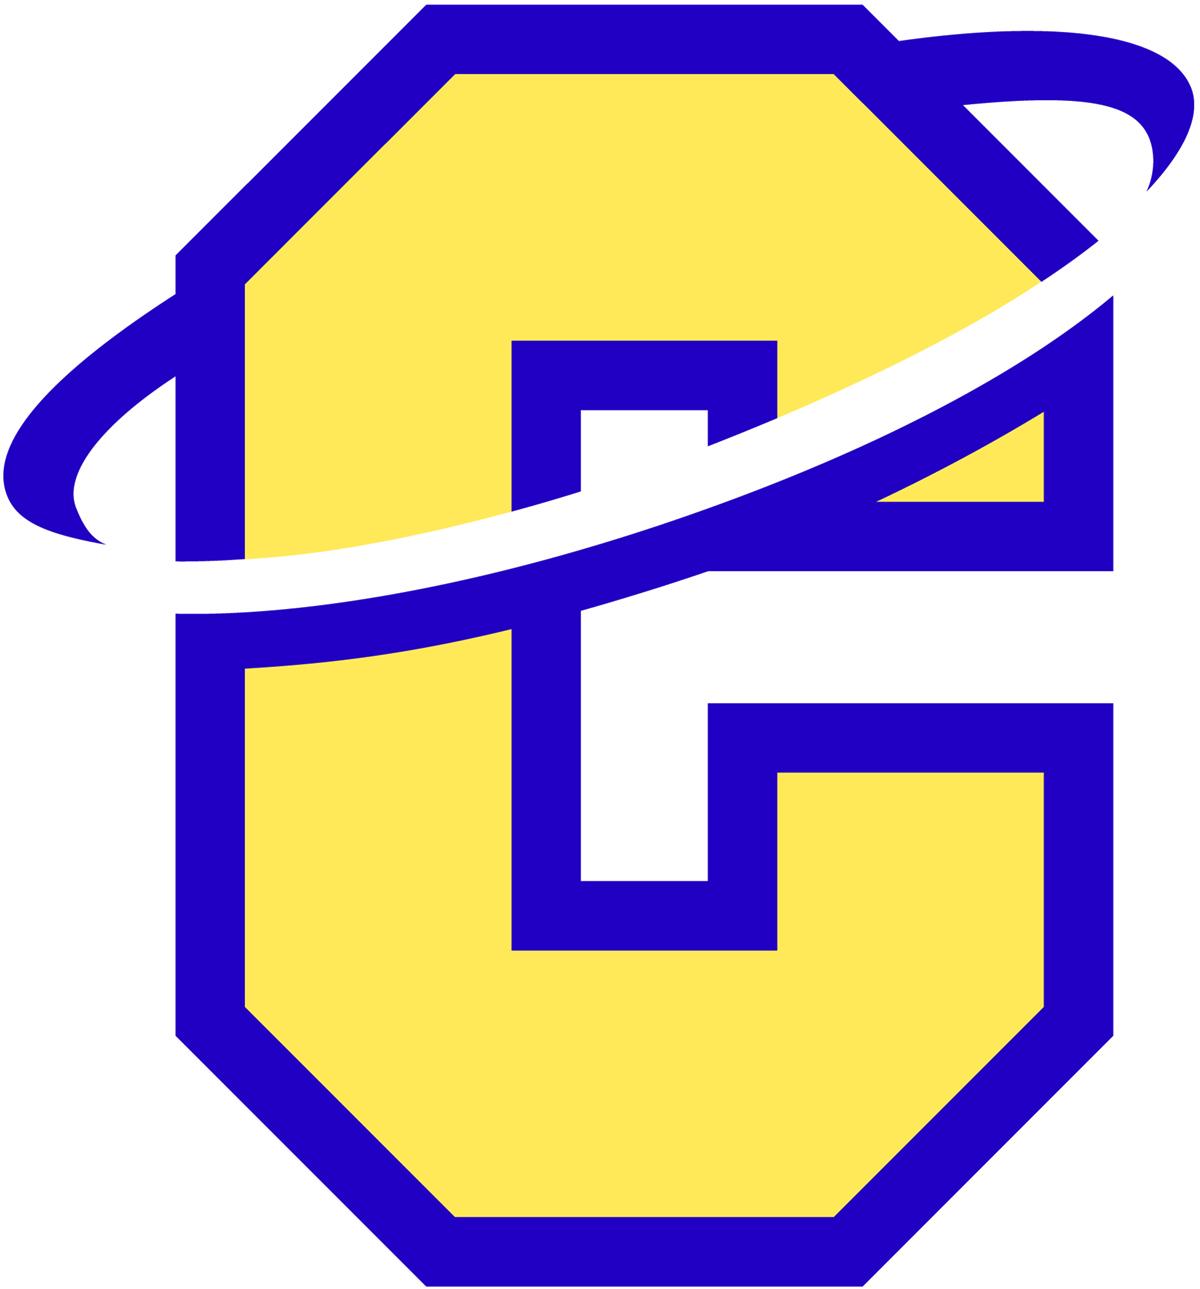 Carroll's 'C' logo